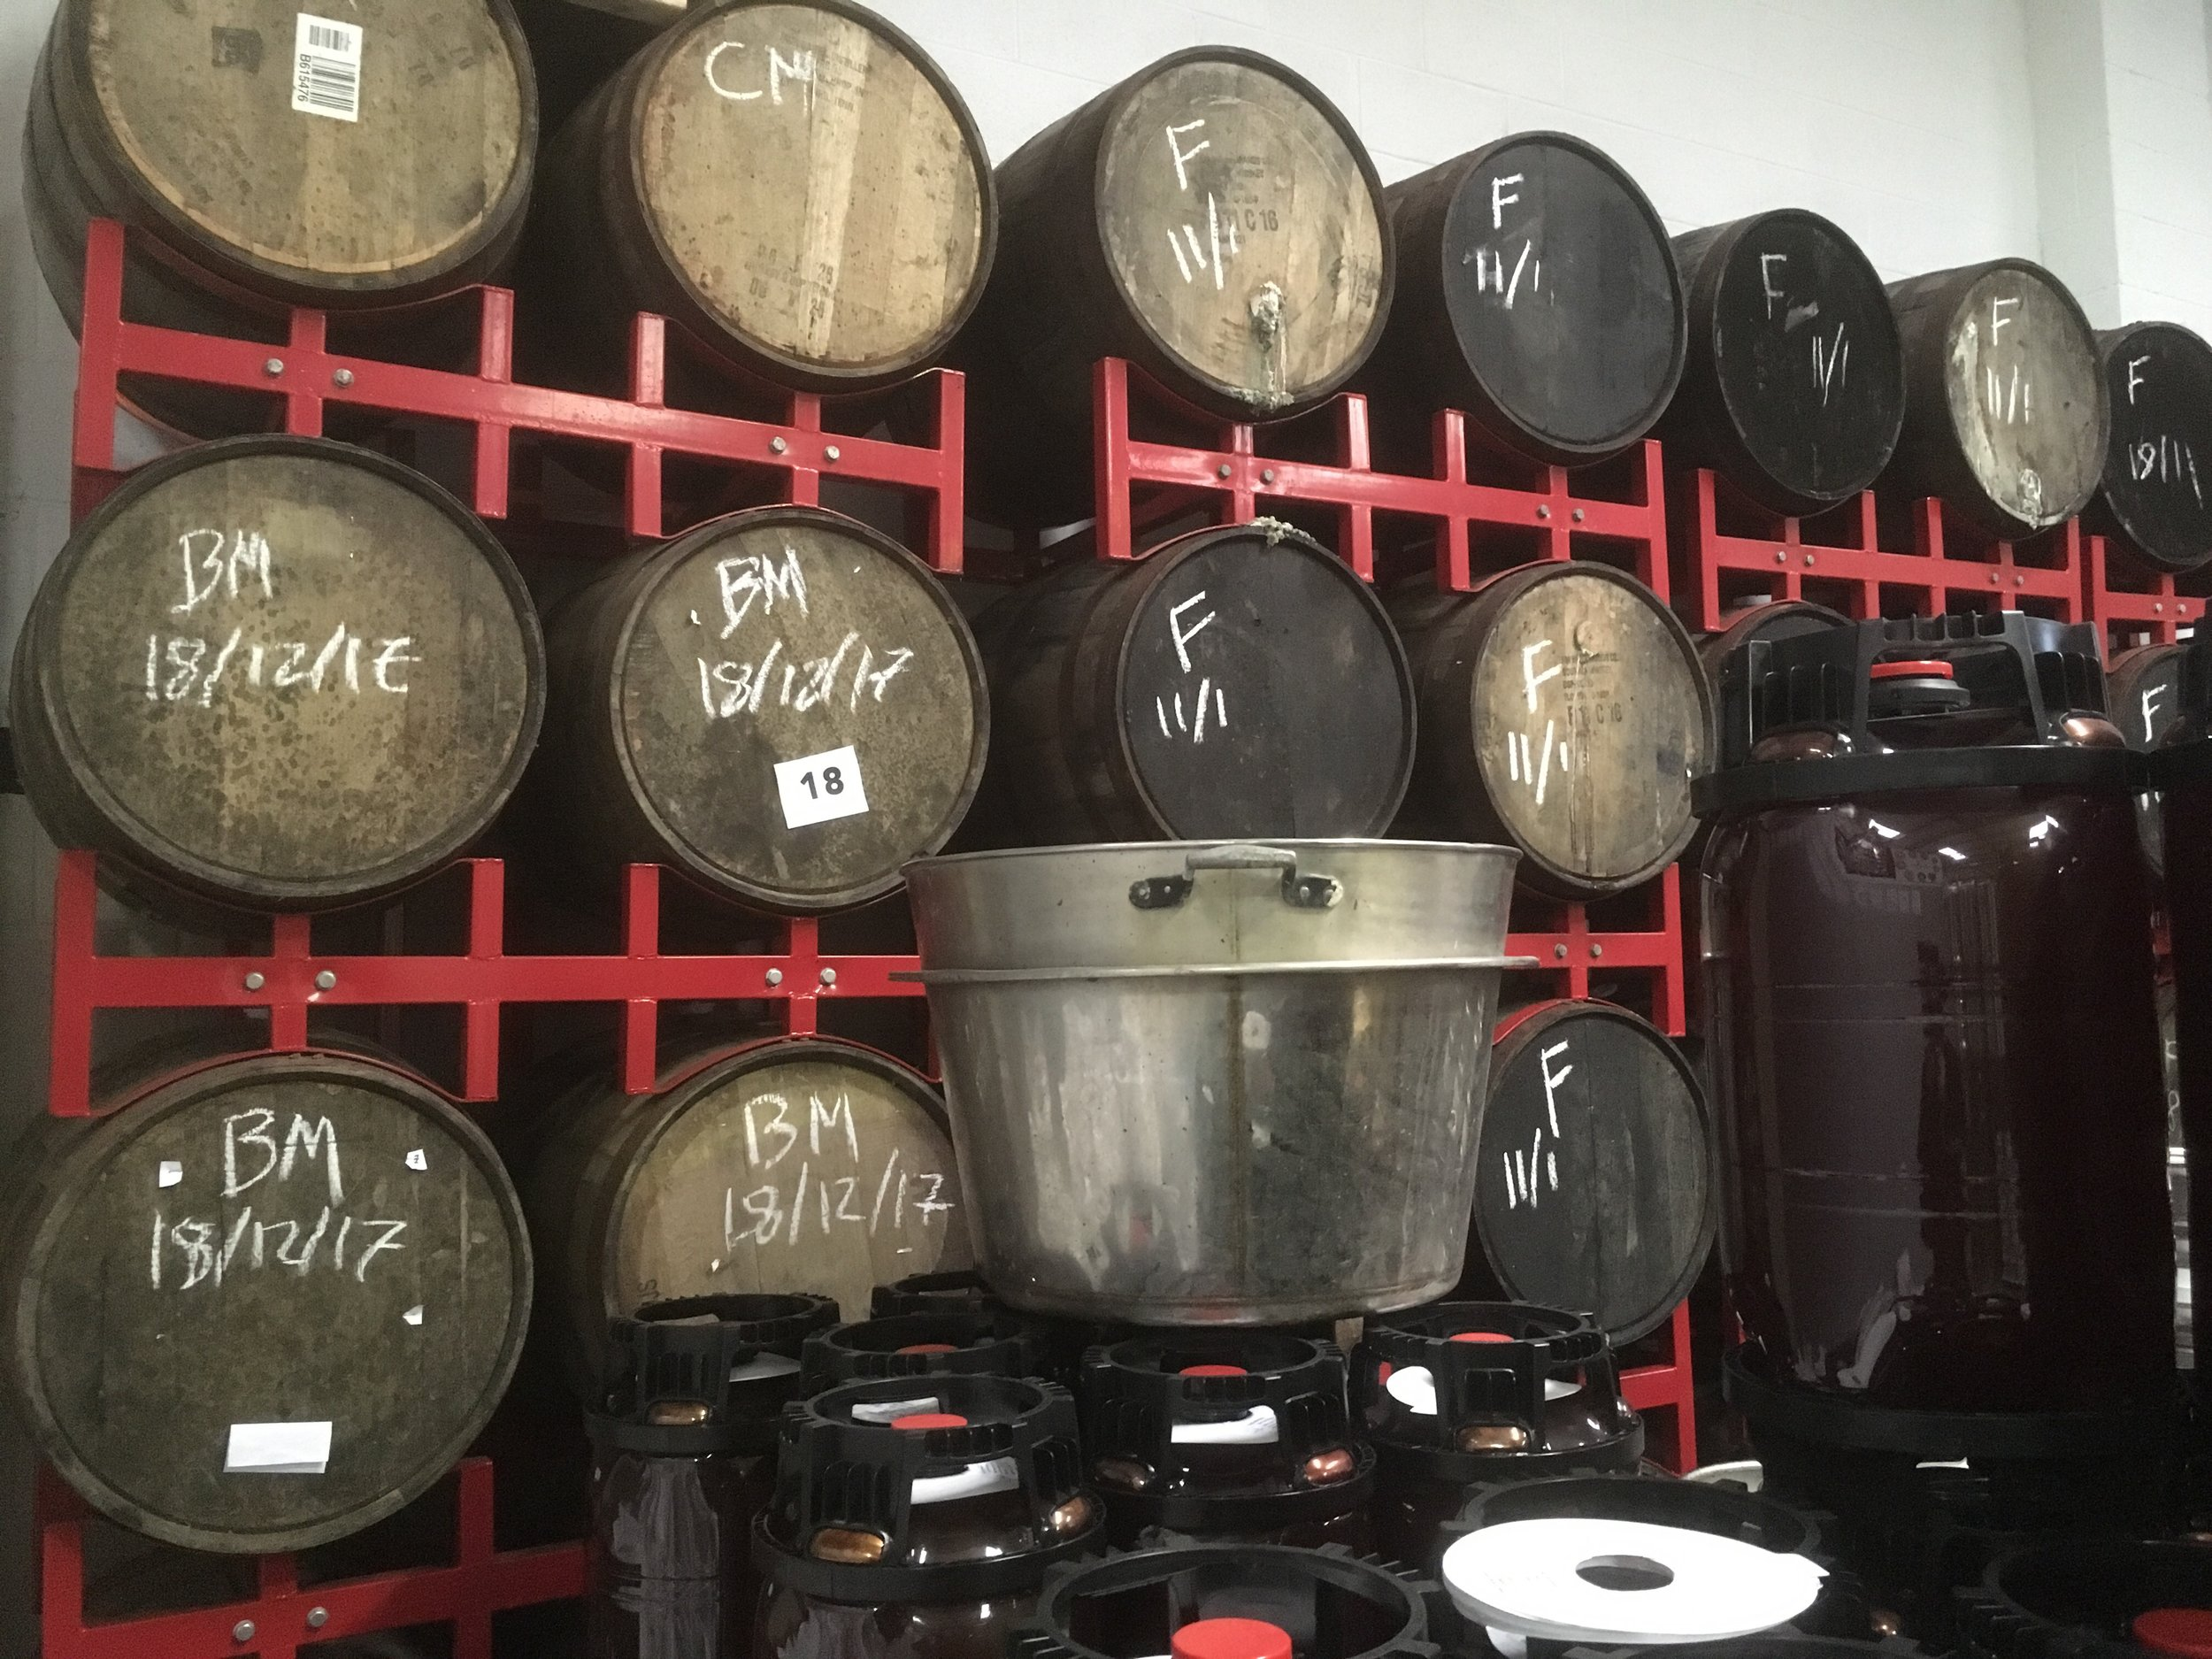 barrel aging beer.jpg